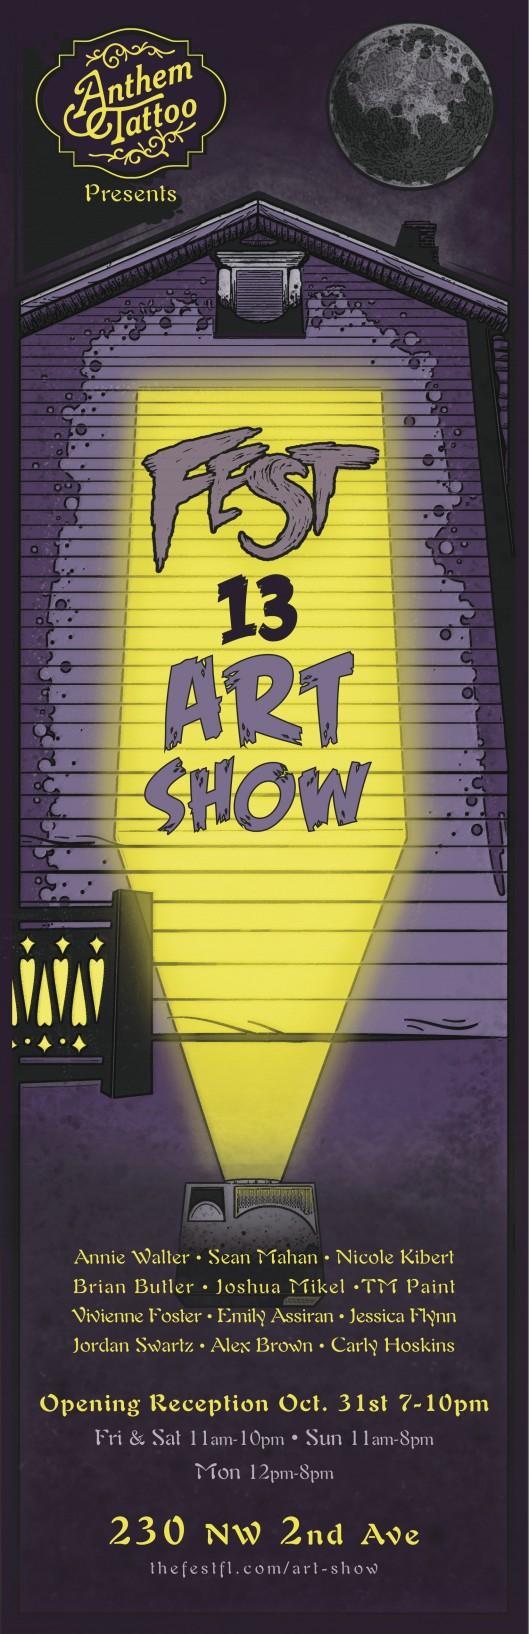 Sean Mahan Fest Art Show